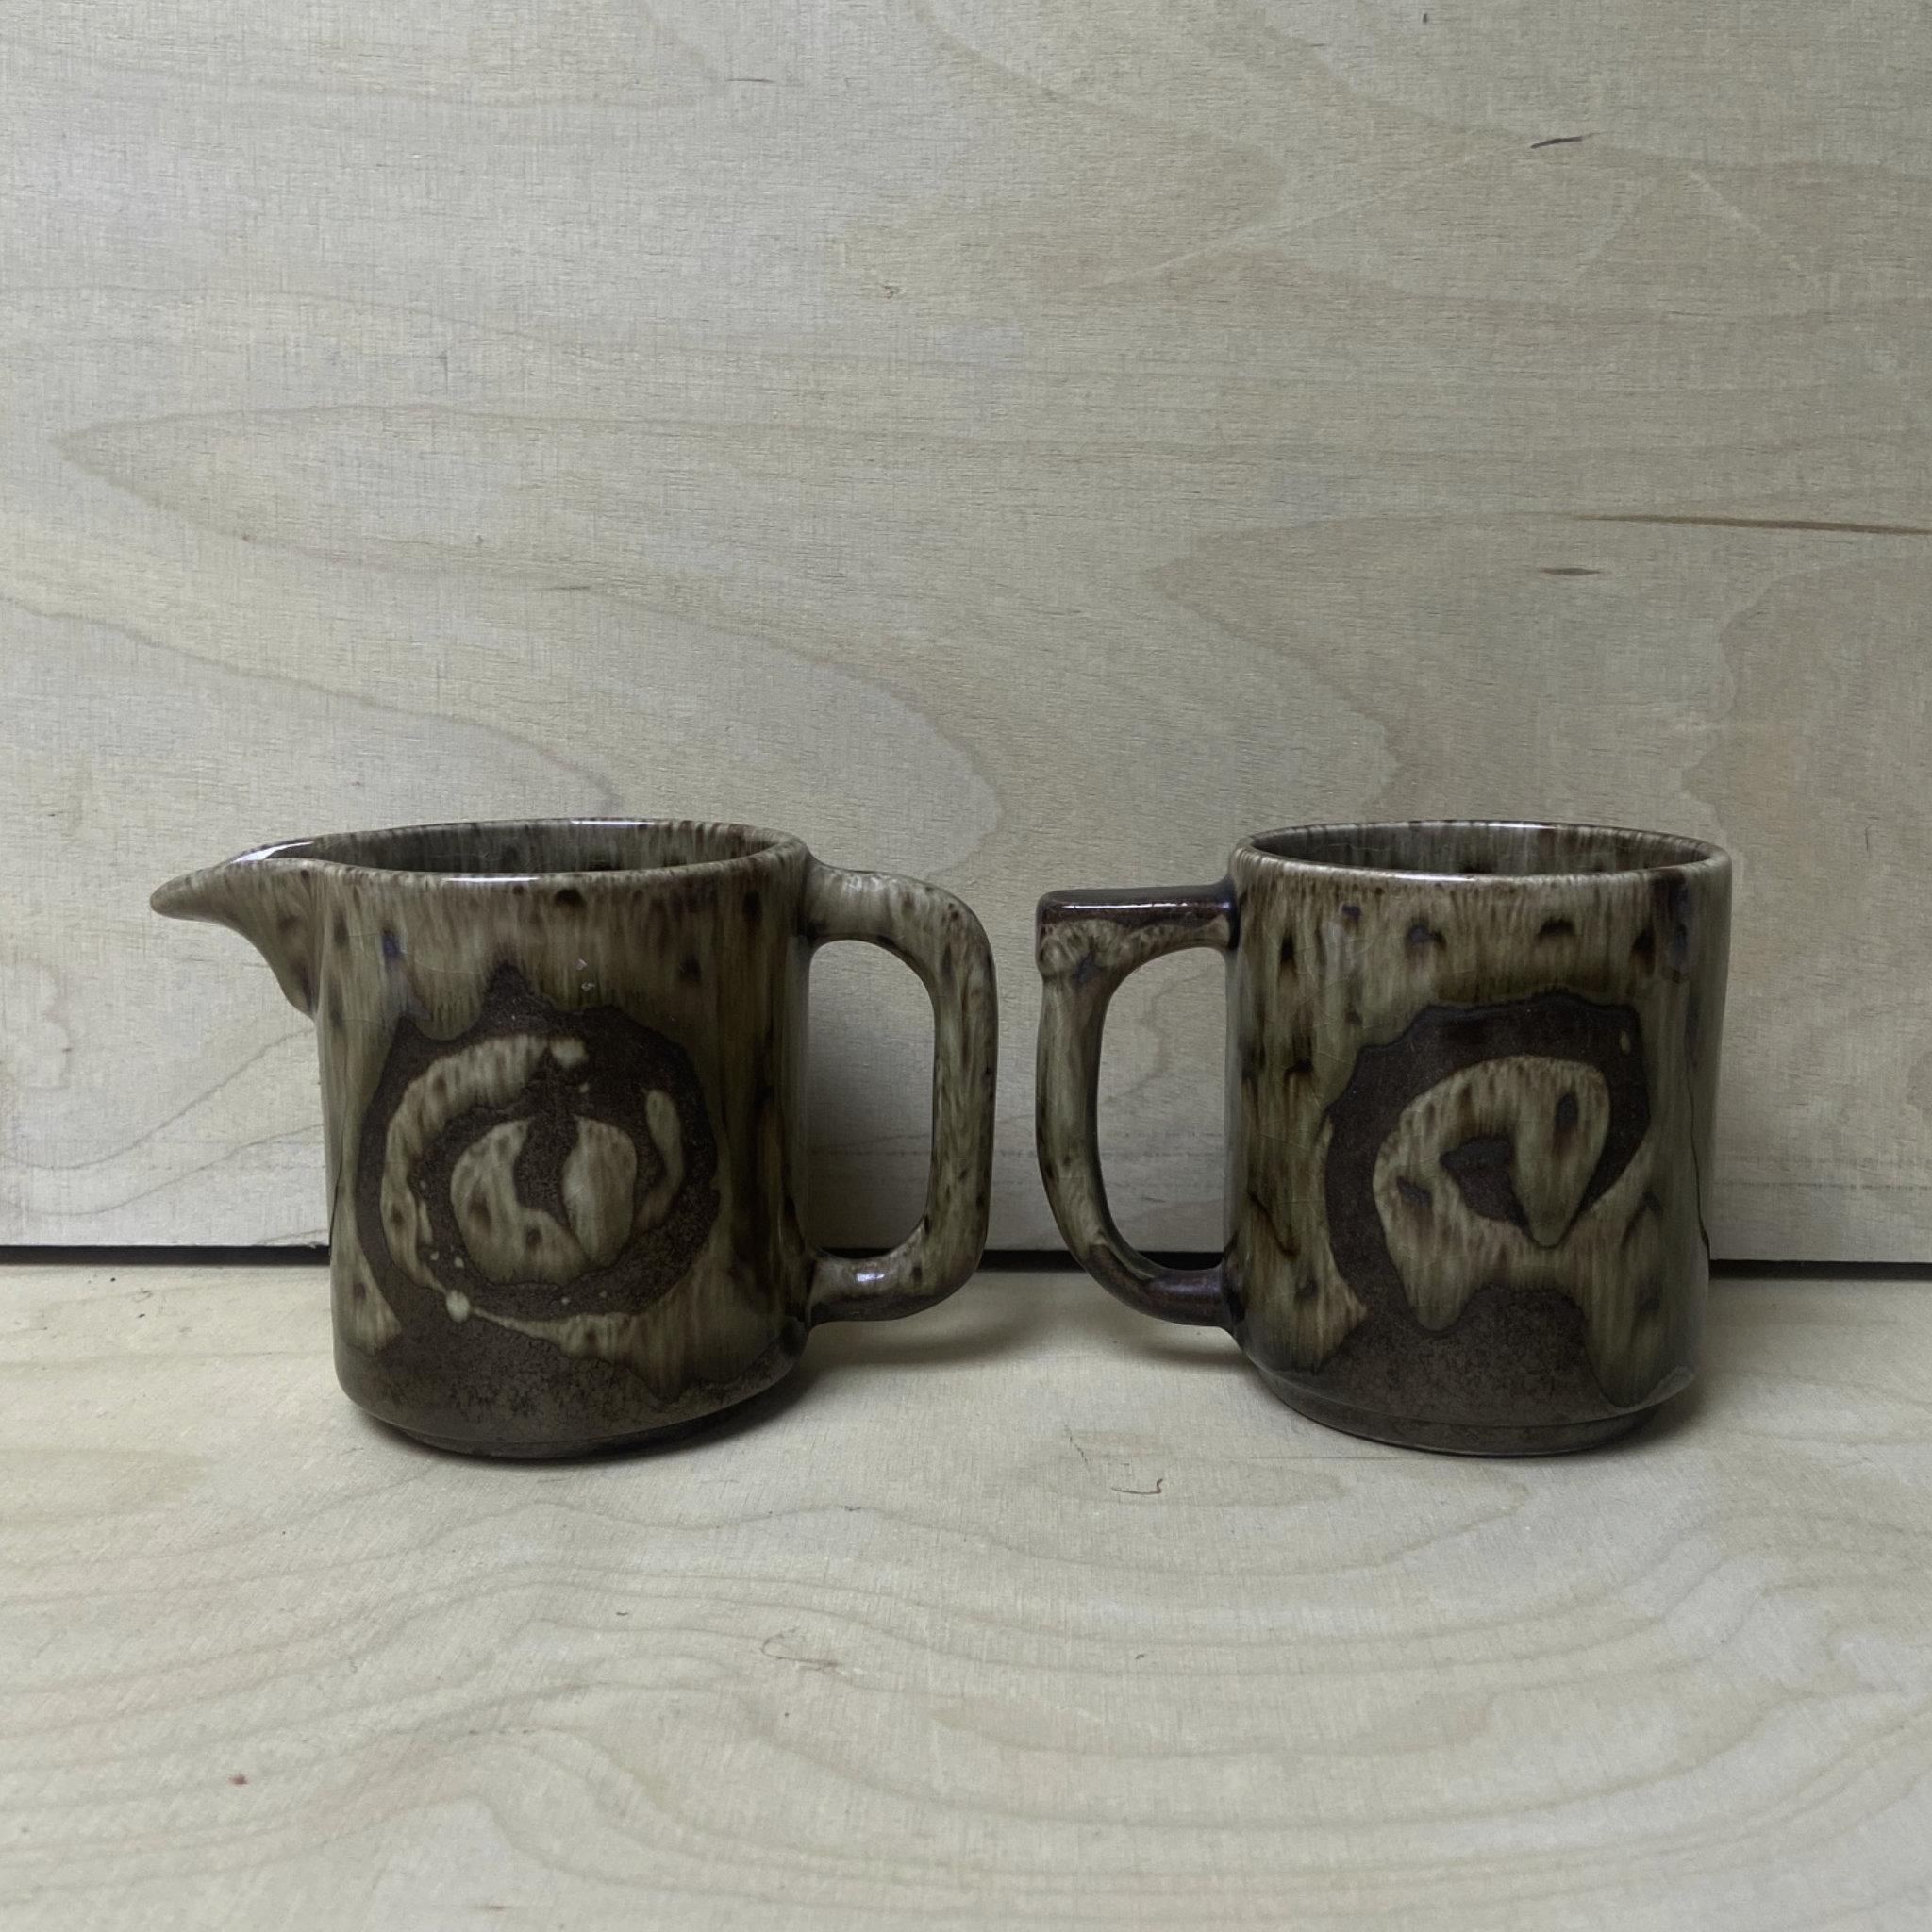 Vintage Cup & Jug Set